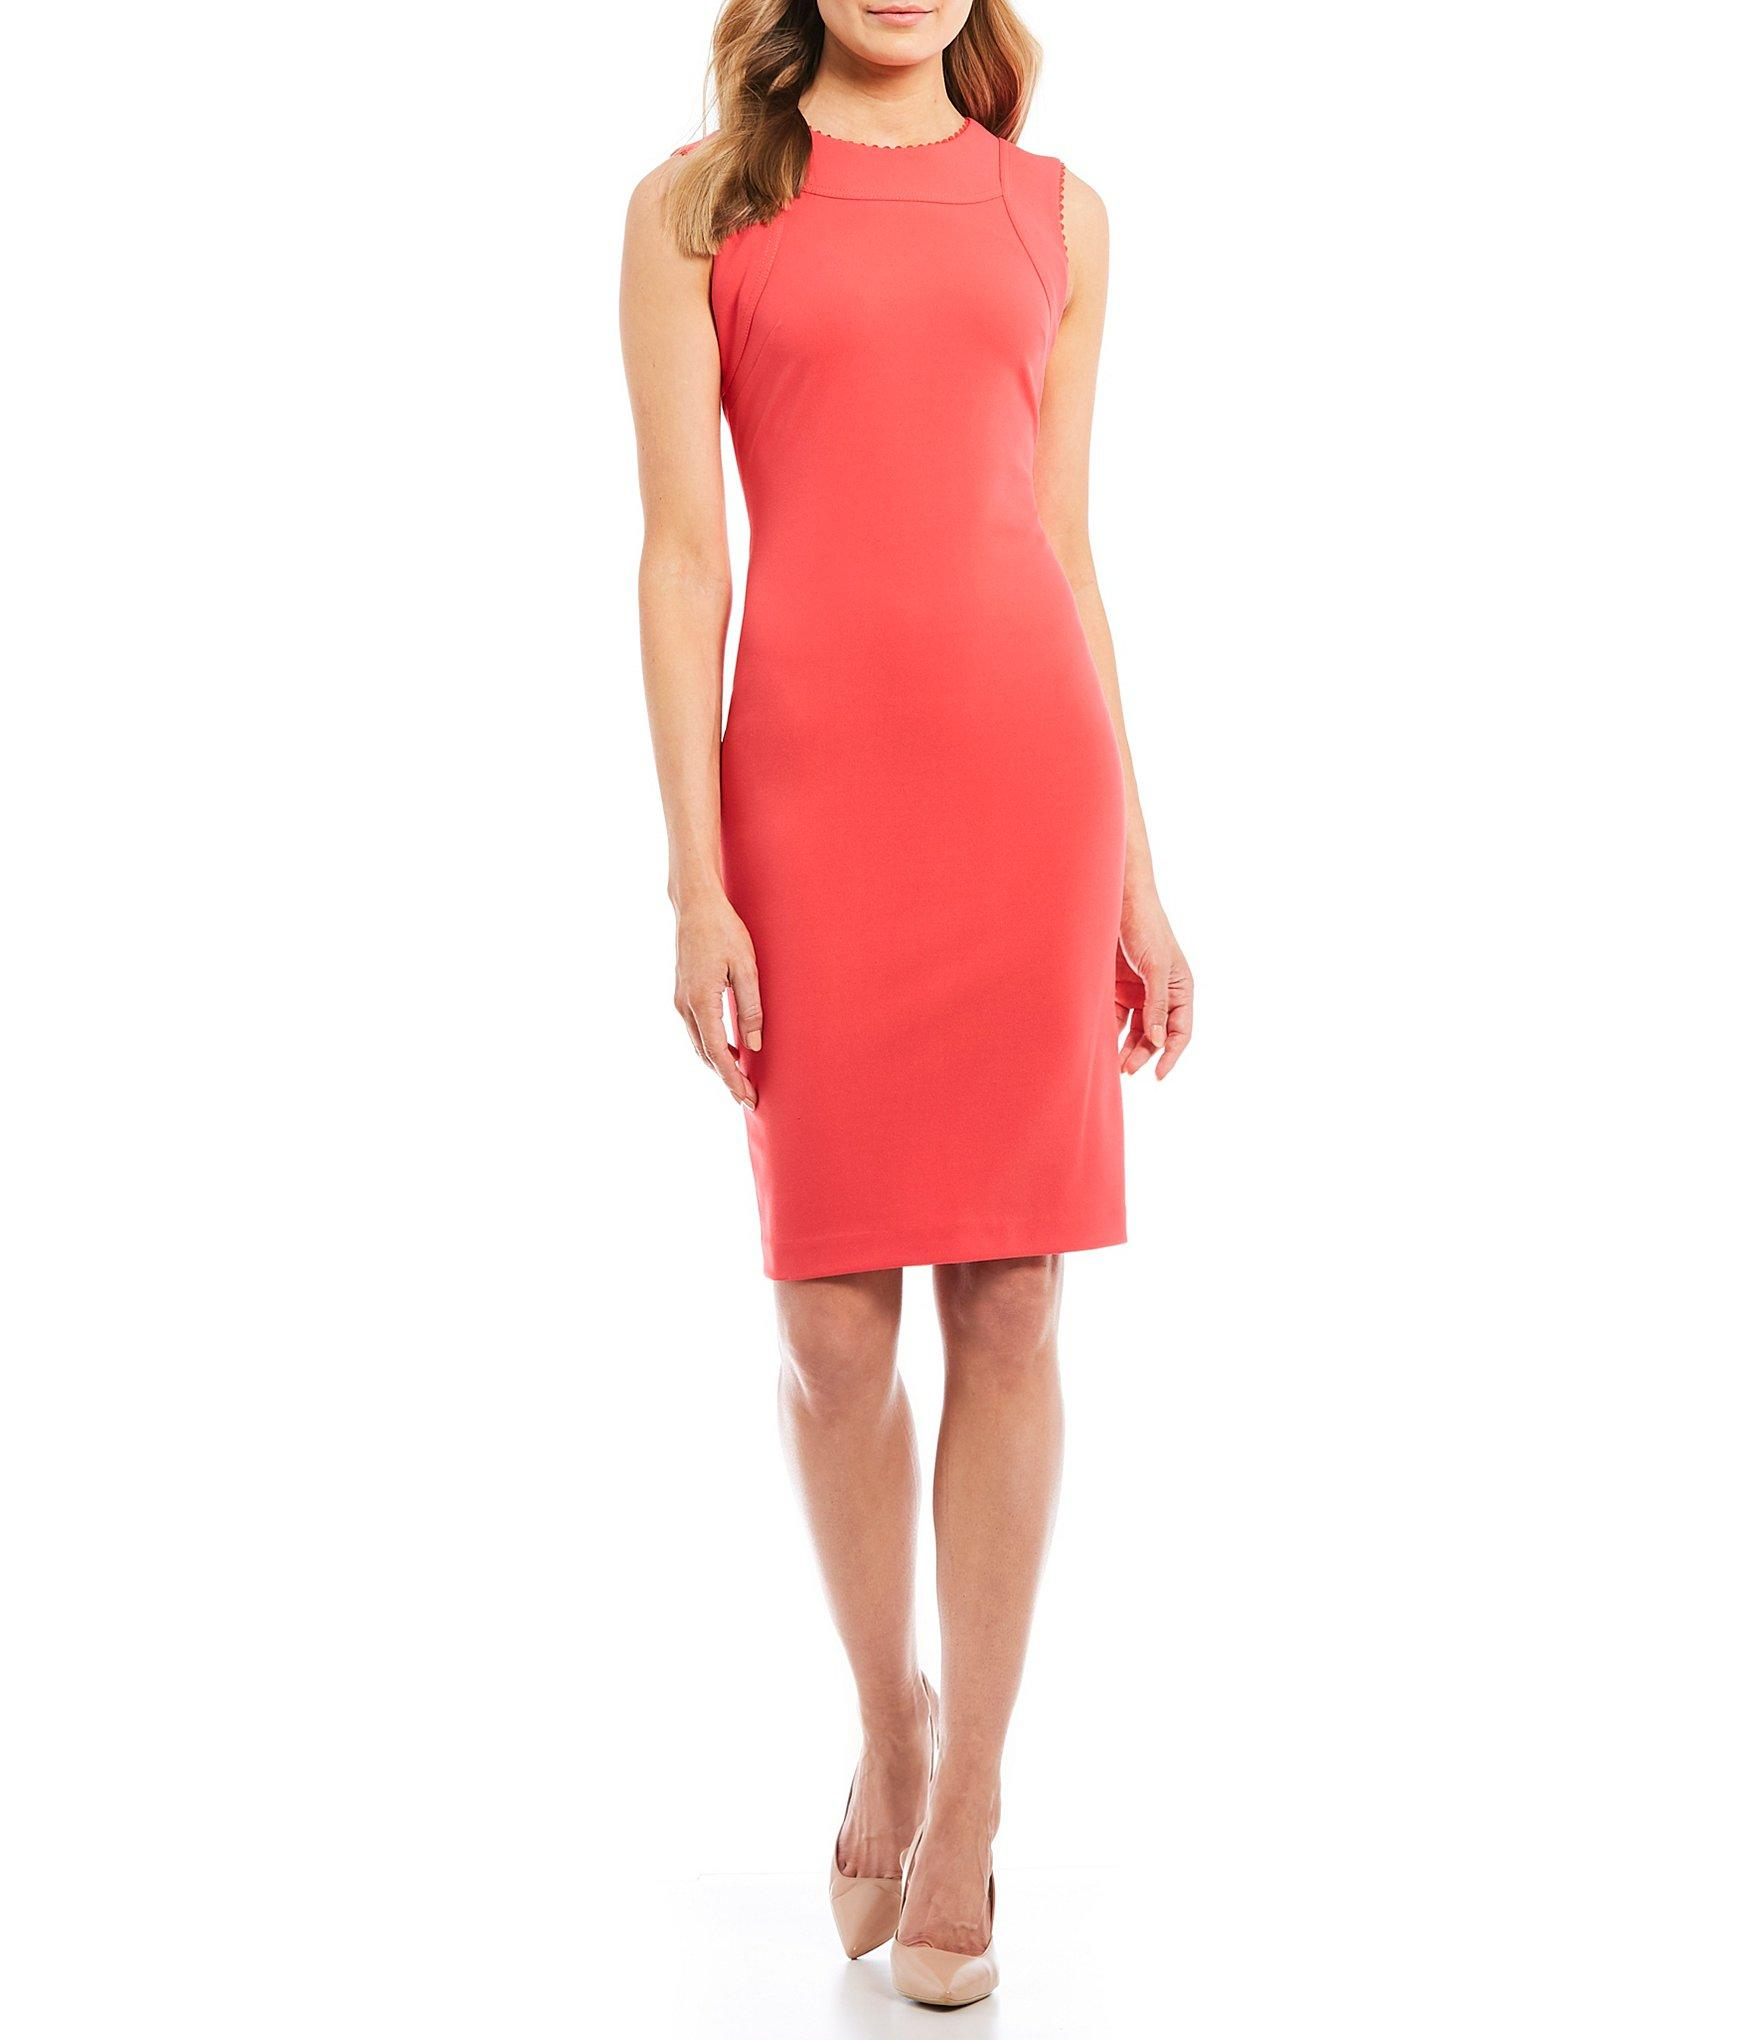 8ba18a5d30c Lyst - Calvin Klein Sleeveless Sheath Dress in Red